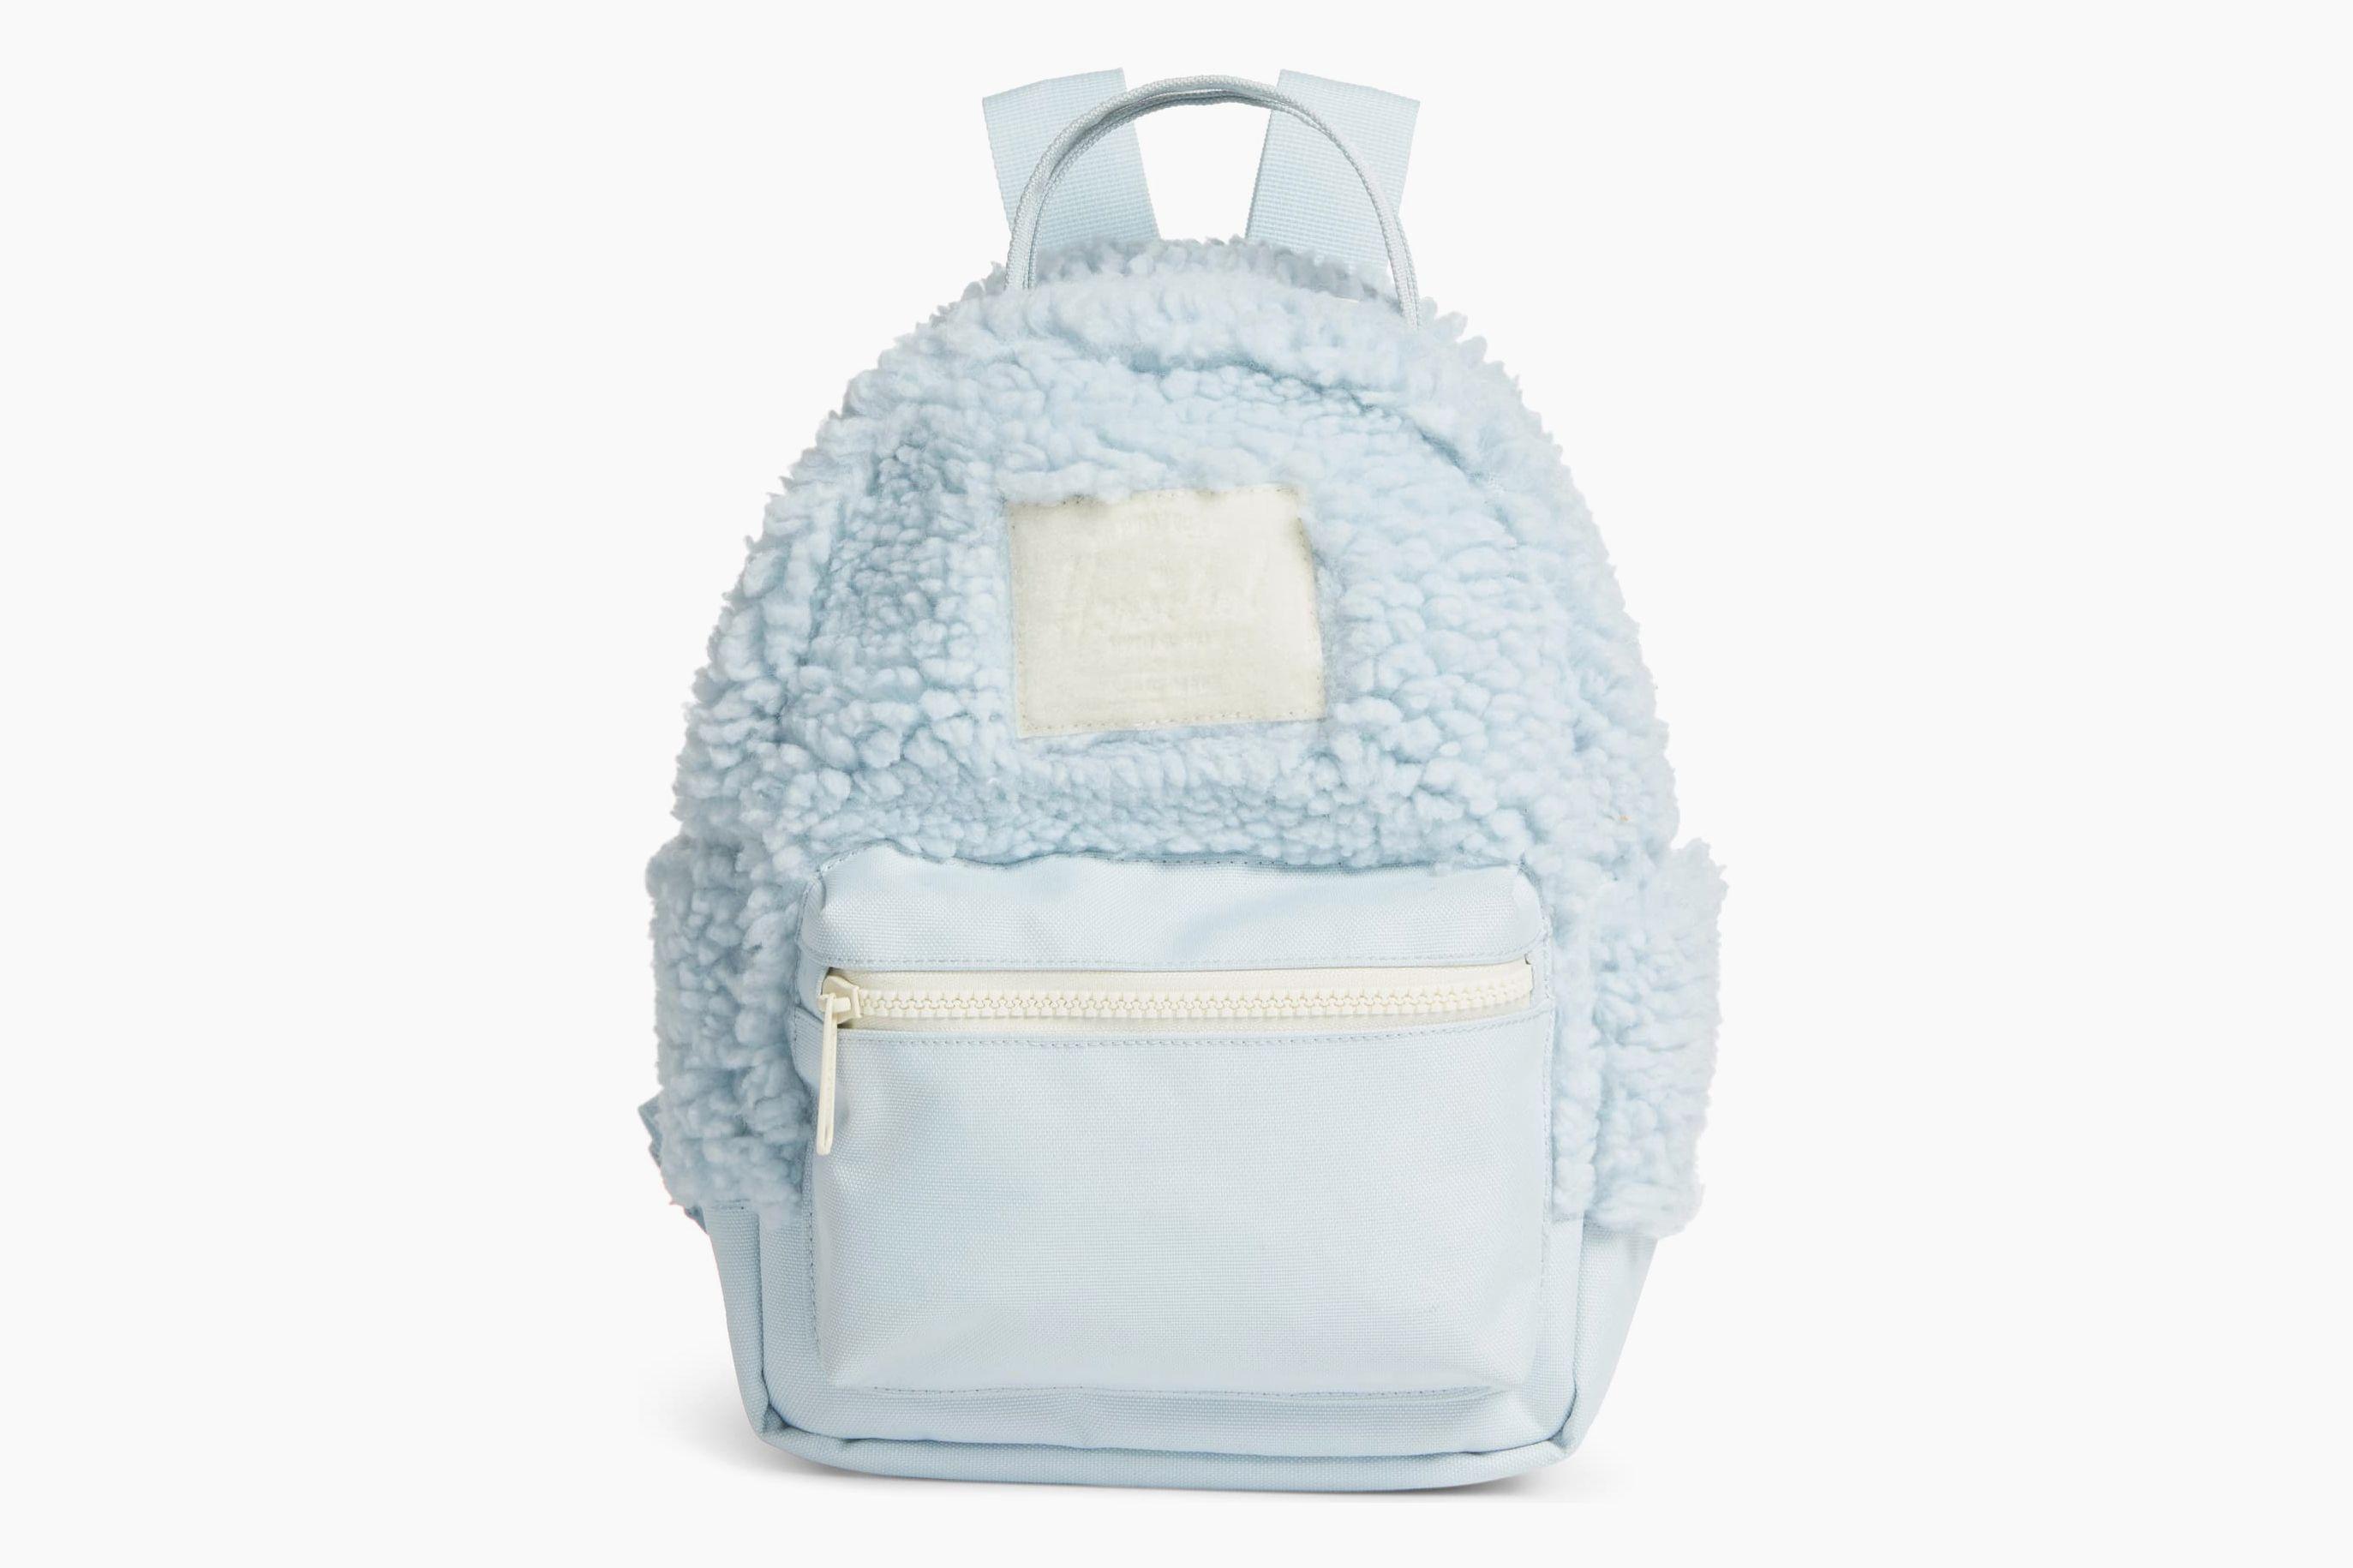 Herschel Supply Co. Mini Nova Fleece & Canvas Backpack